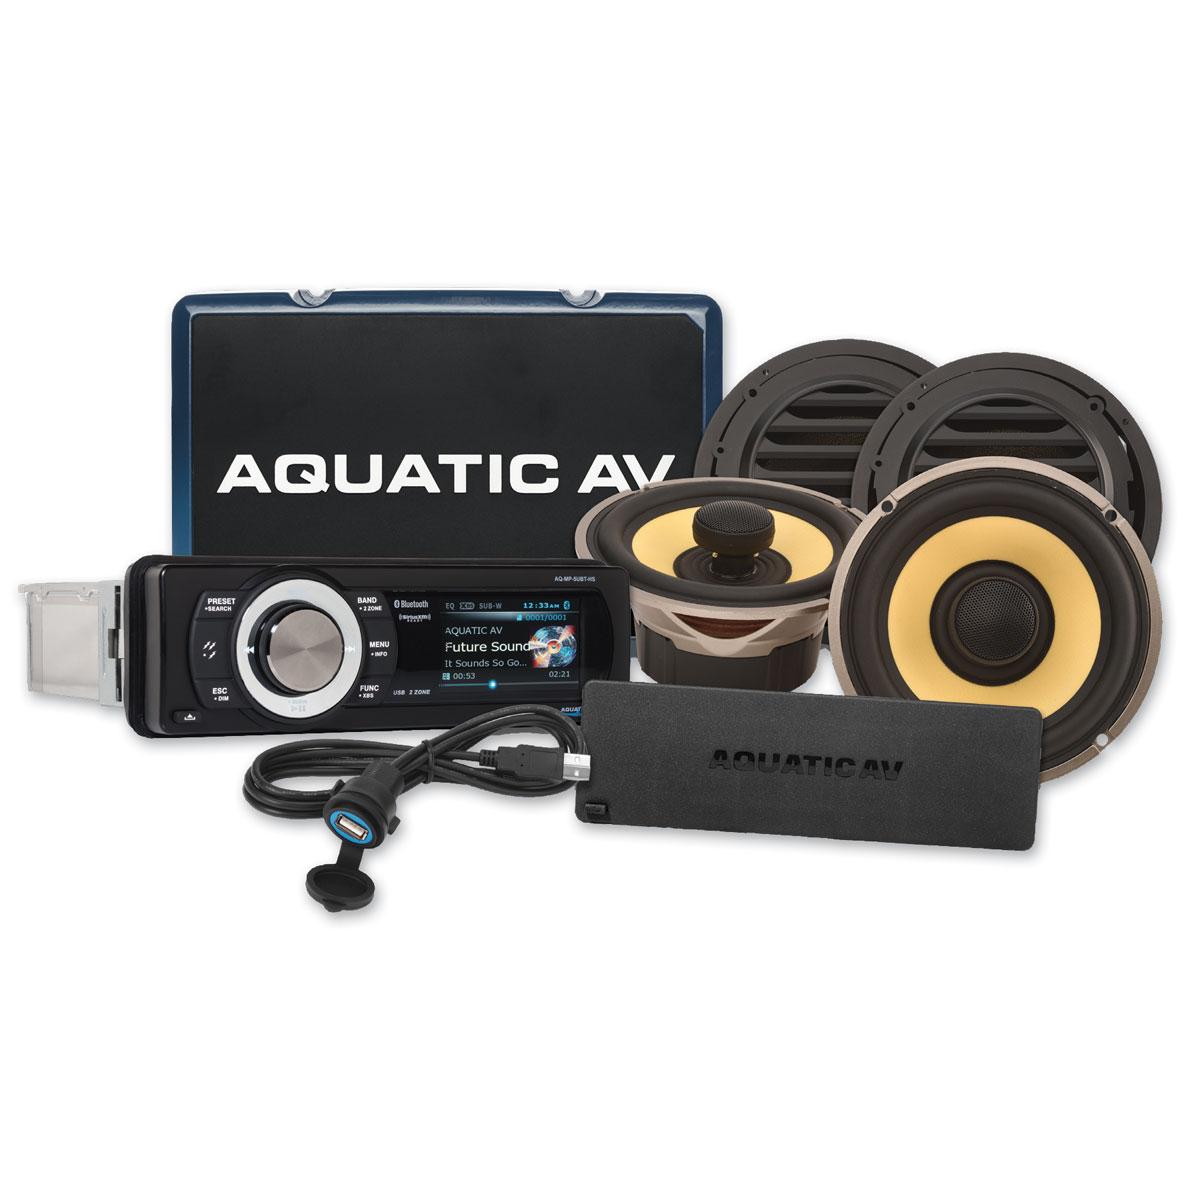 Aquatic AV Ultra SiriusXM, Bluetooth, Audio Package